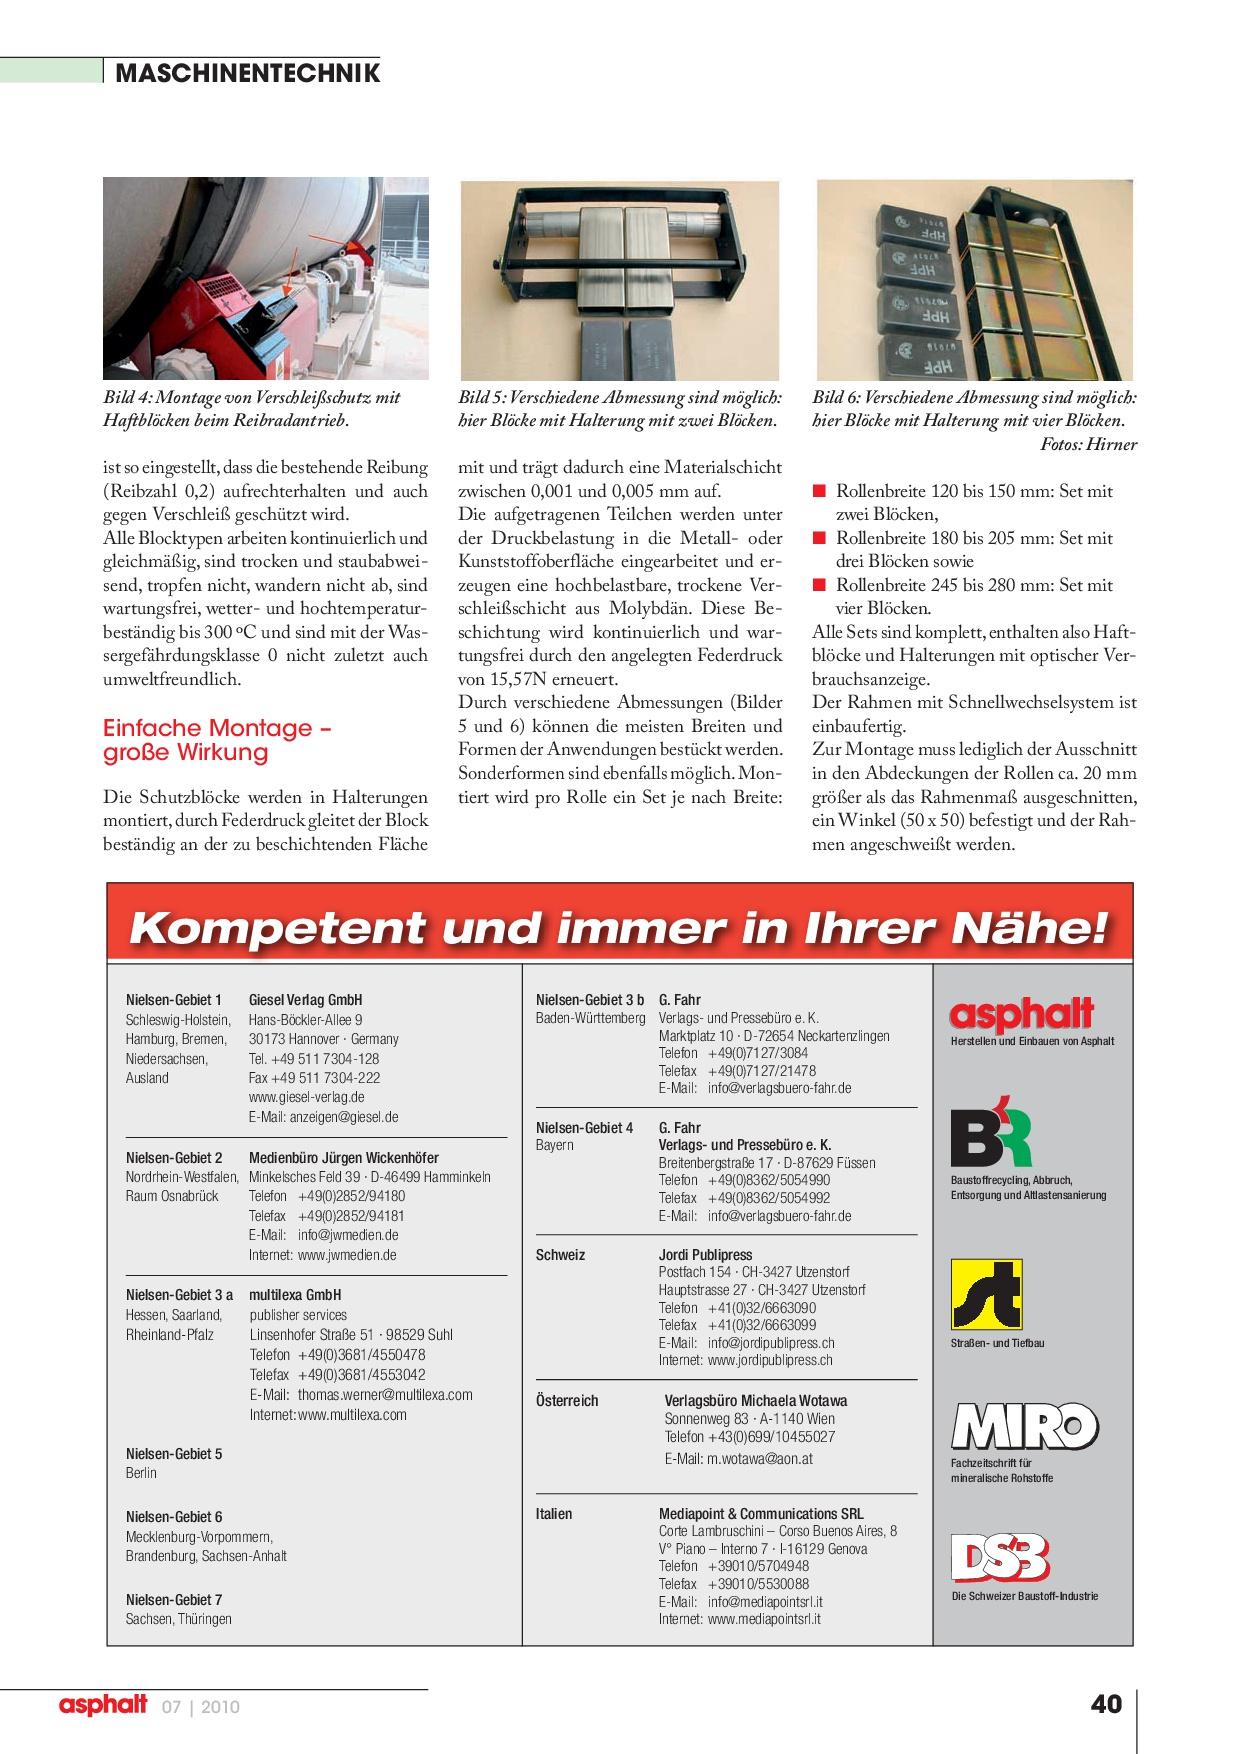 Asphalt Magazin - Verschleißschutz senkt Kosten